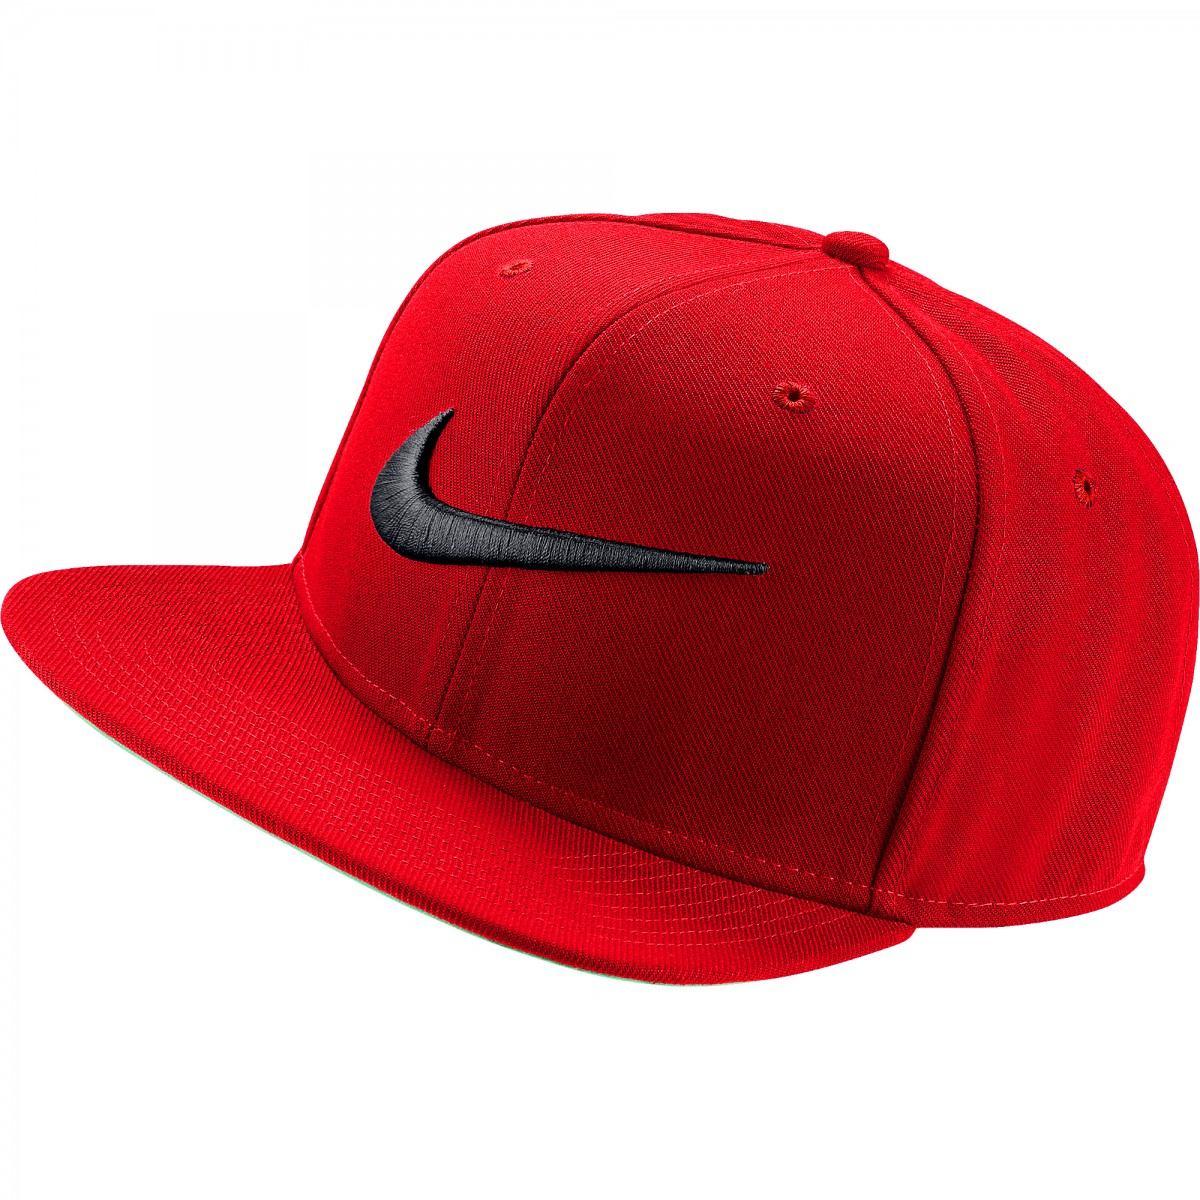 Boné Nike Qt Pro-swoosh Original + 100%garantia + Nfe Freecs - R ... 792bce61b823e